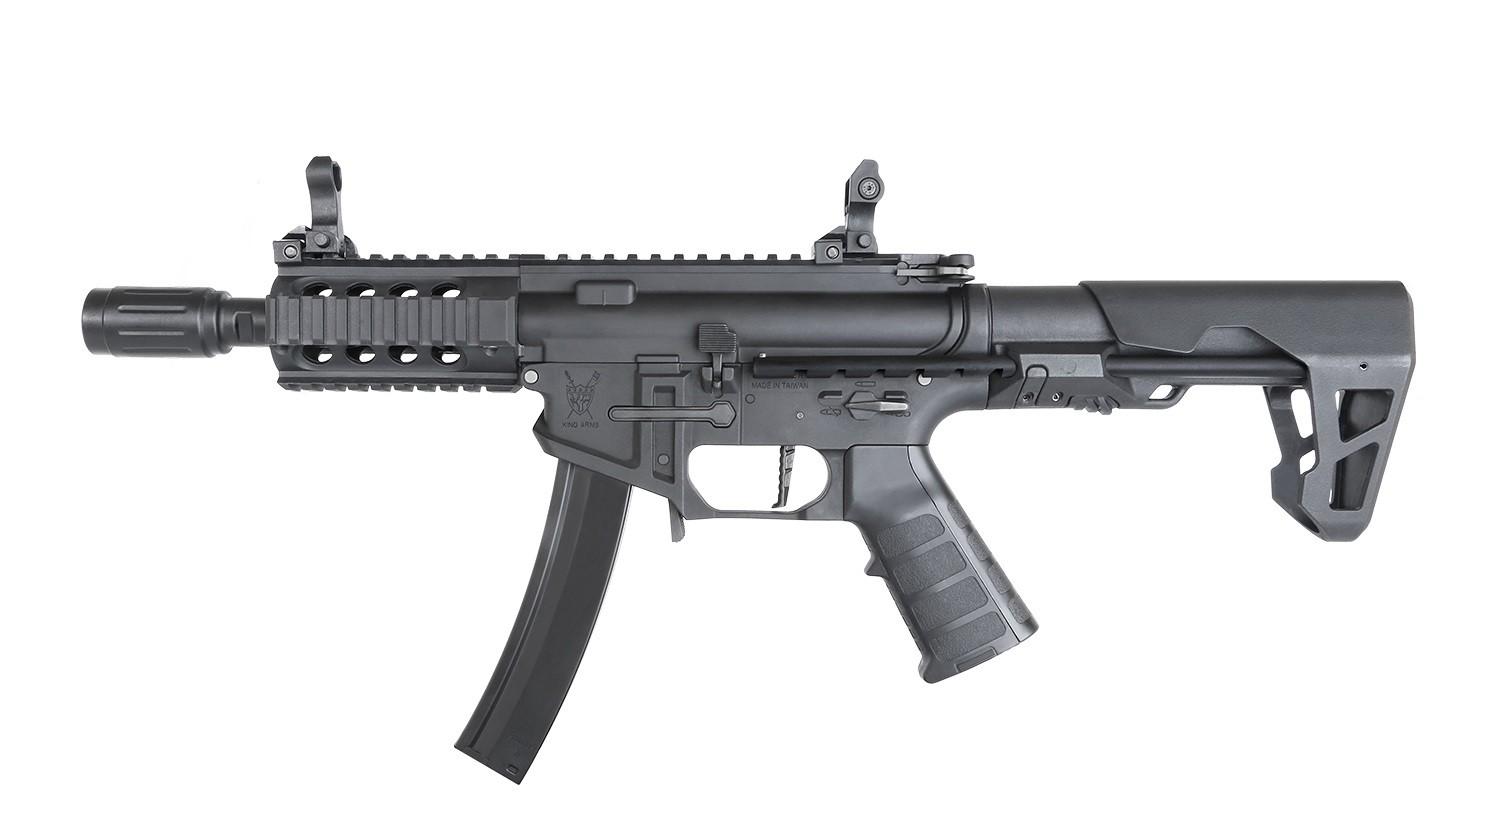 King Arms - Carabine PDW9 SBR Shorty - AEG - Noir  (1.2 Joule)